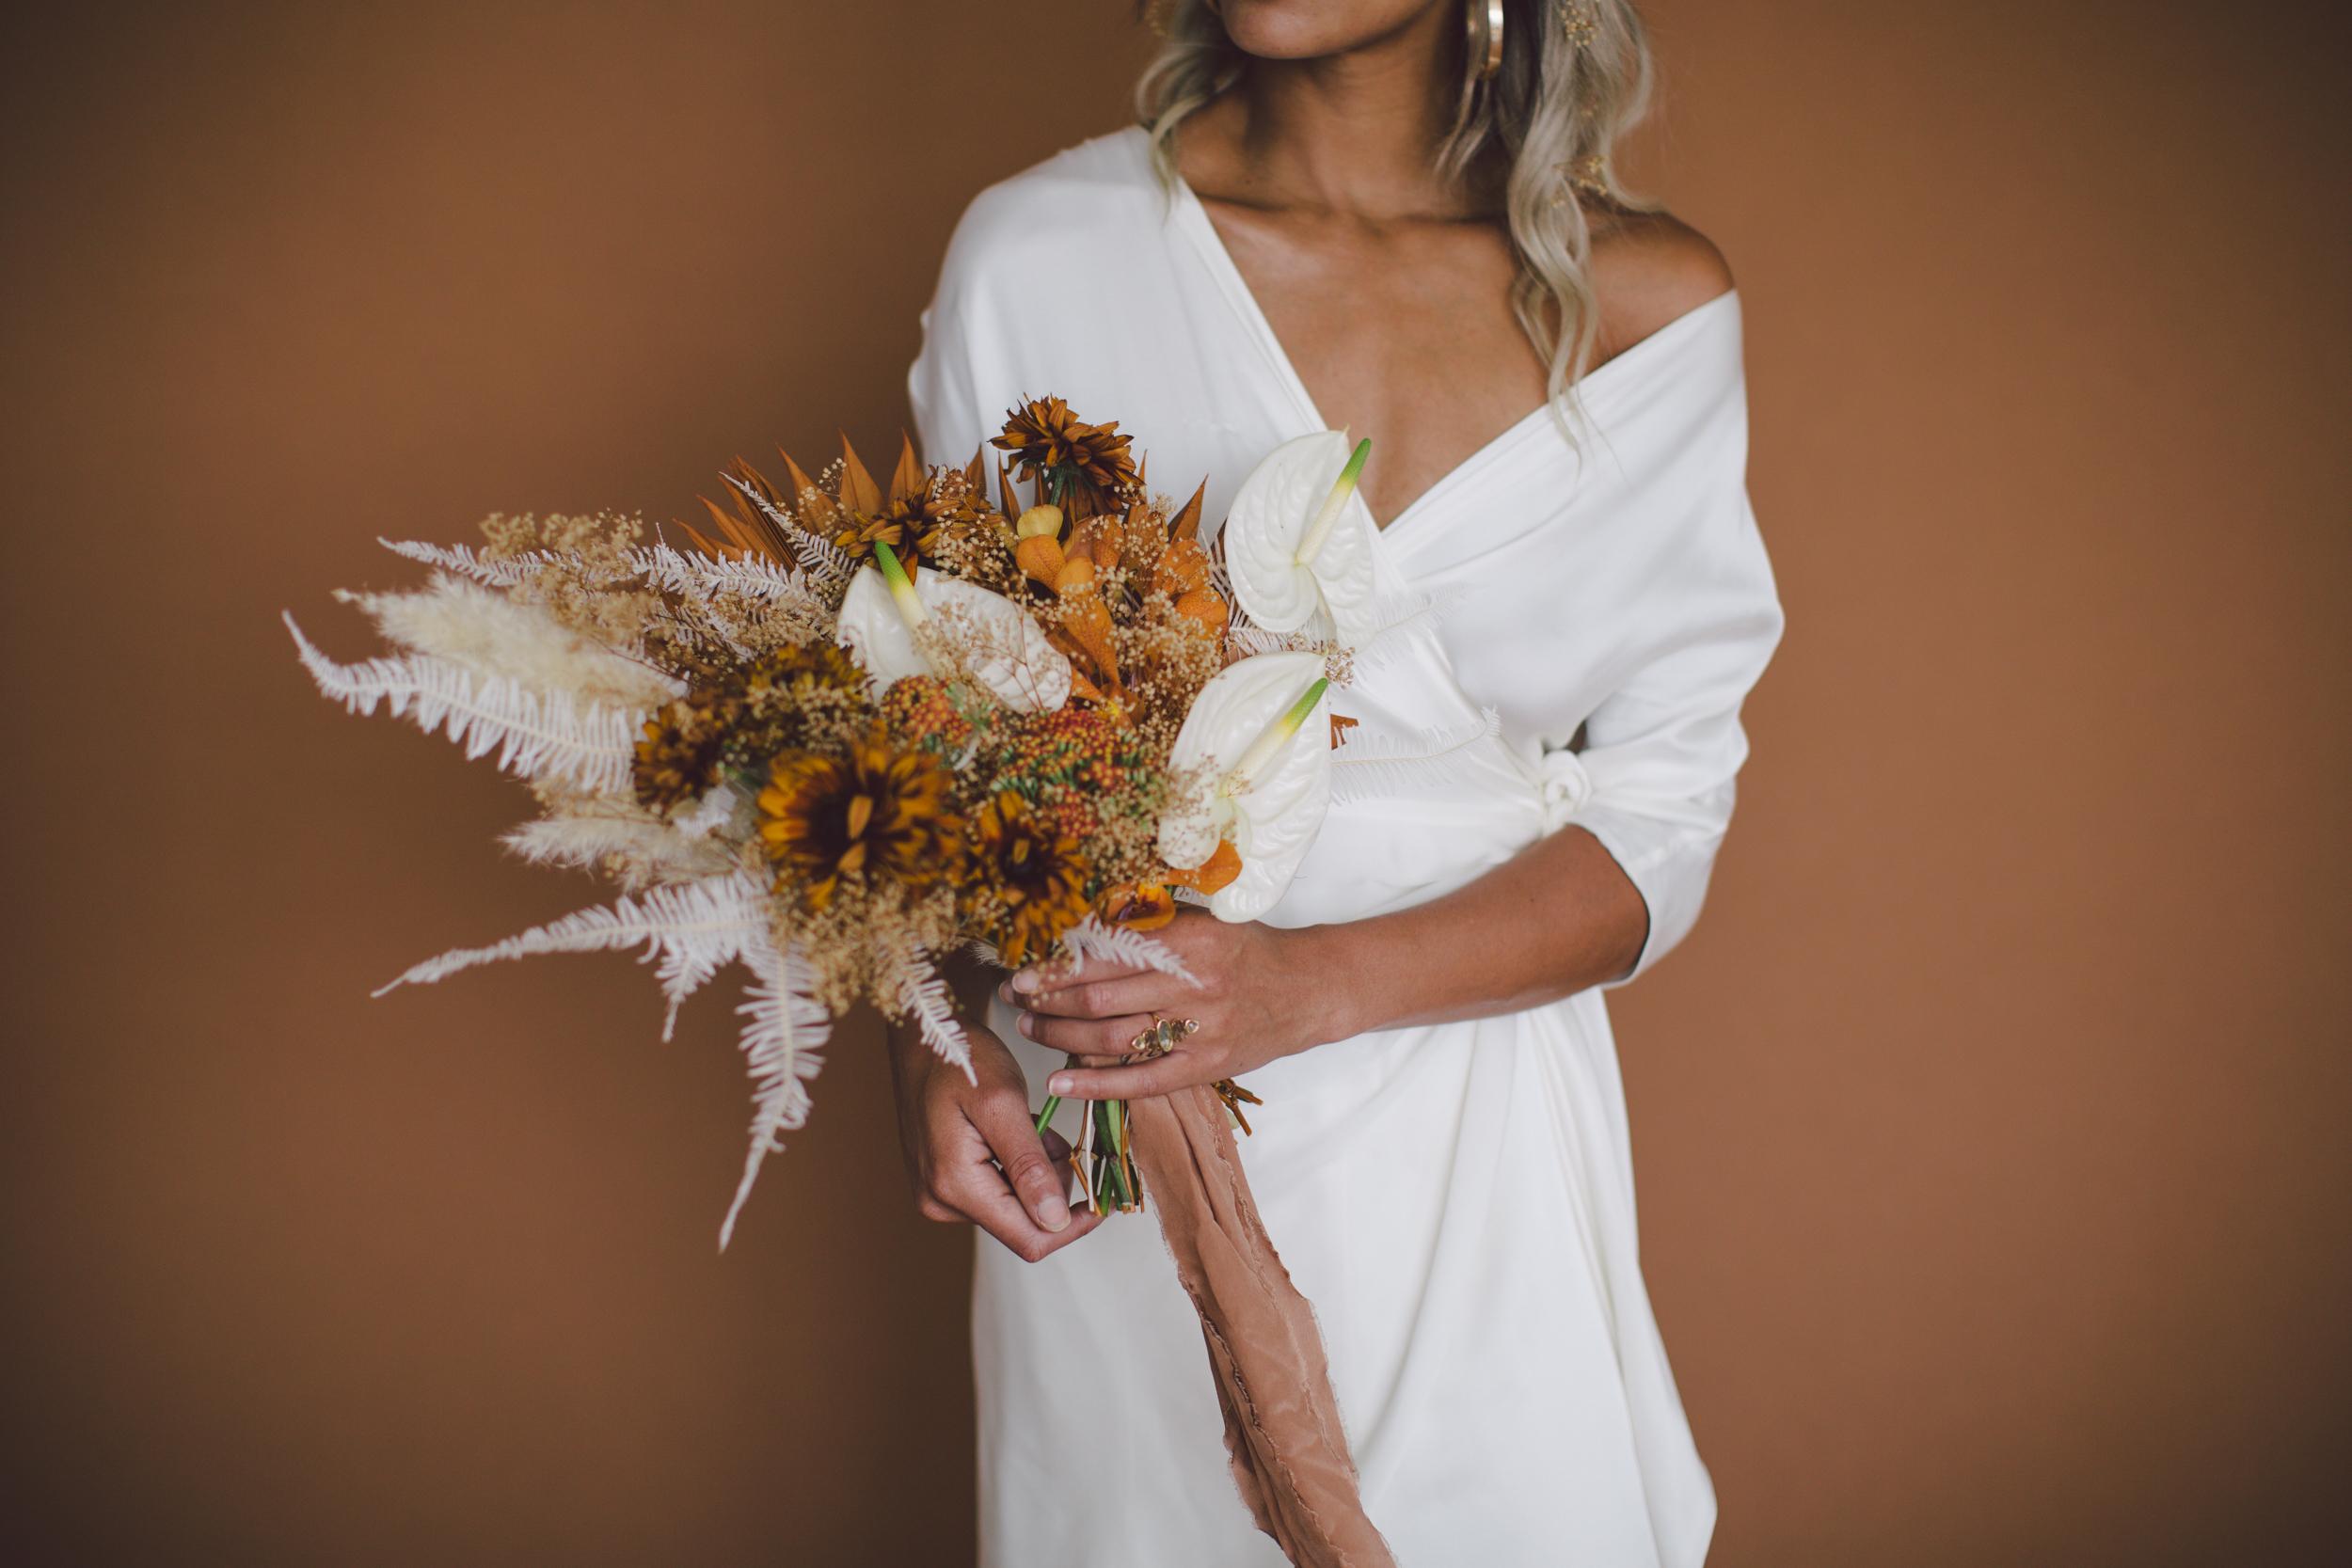 boho dried flower bouquet fall sienna african american bride